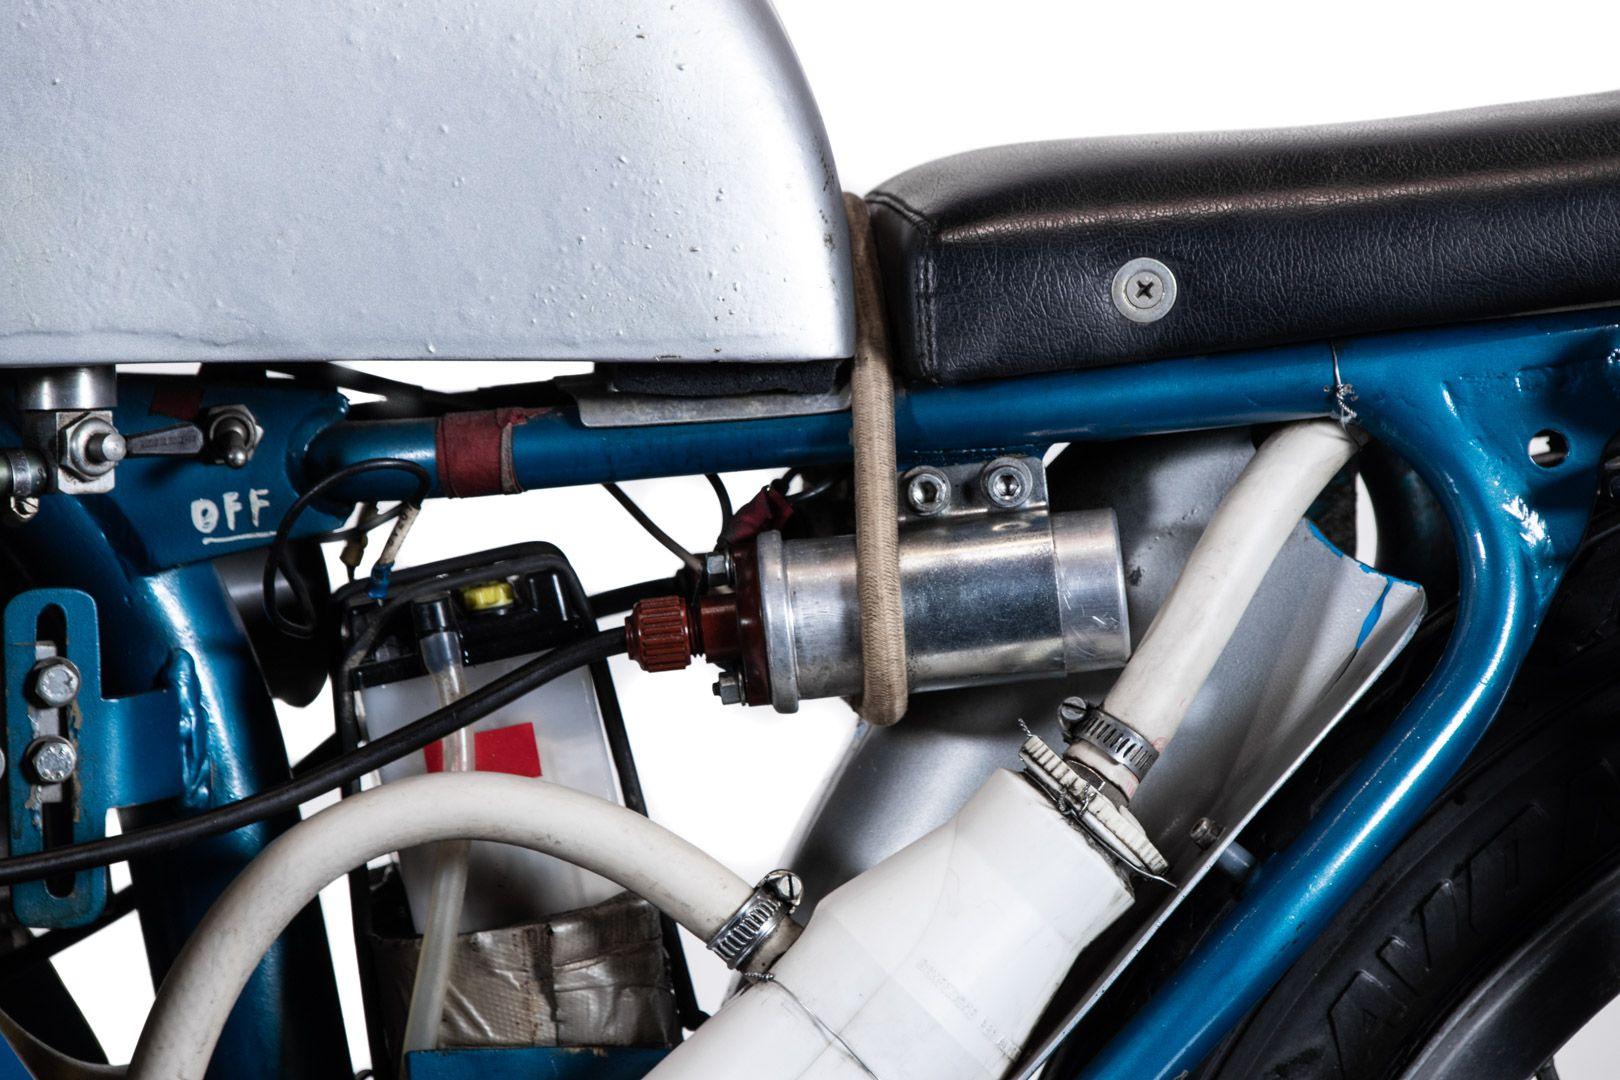 1960 Ducati Mach 1 Corsa NCR 82195